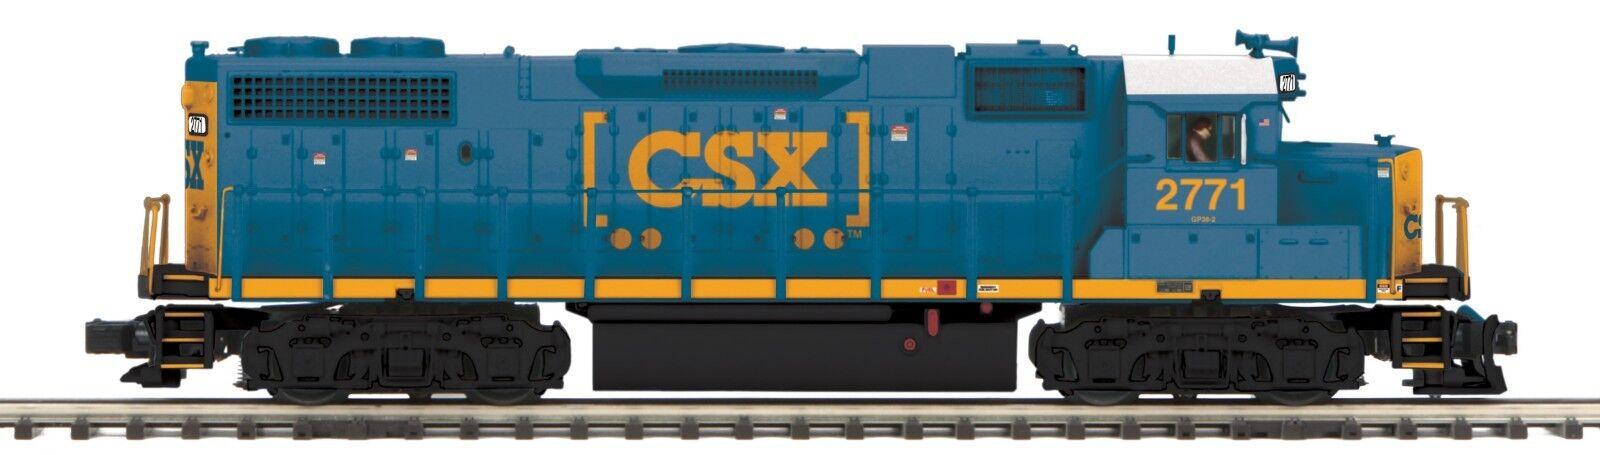 MTH 20-20906-1 O Scale Premier GP38-2 Diesel Engine With Proto-Sound 3.0 (Hi-Rai